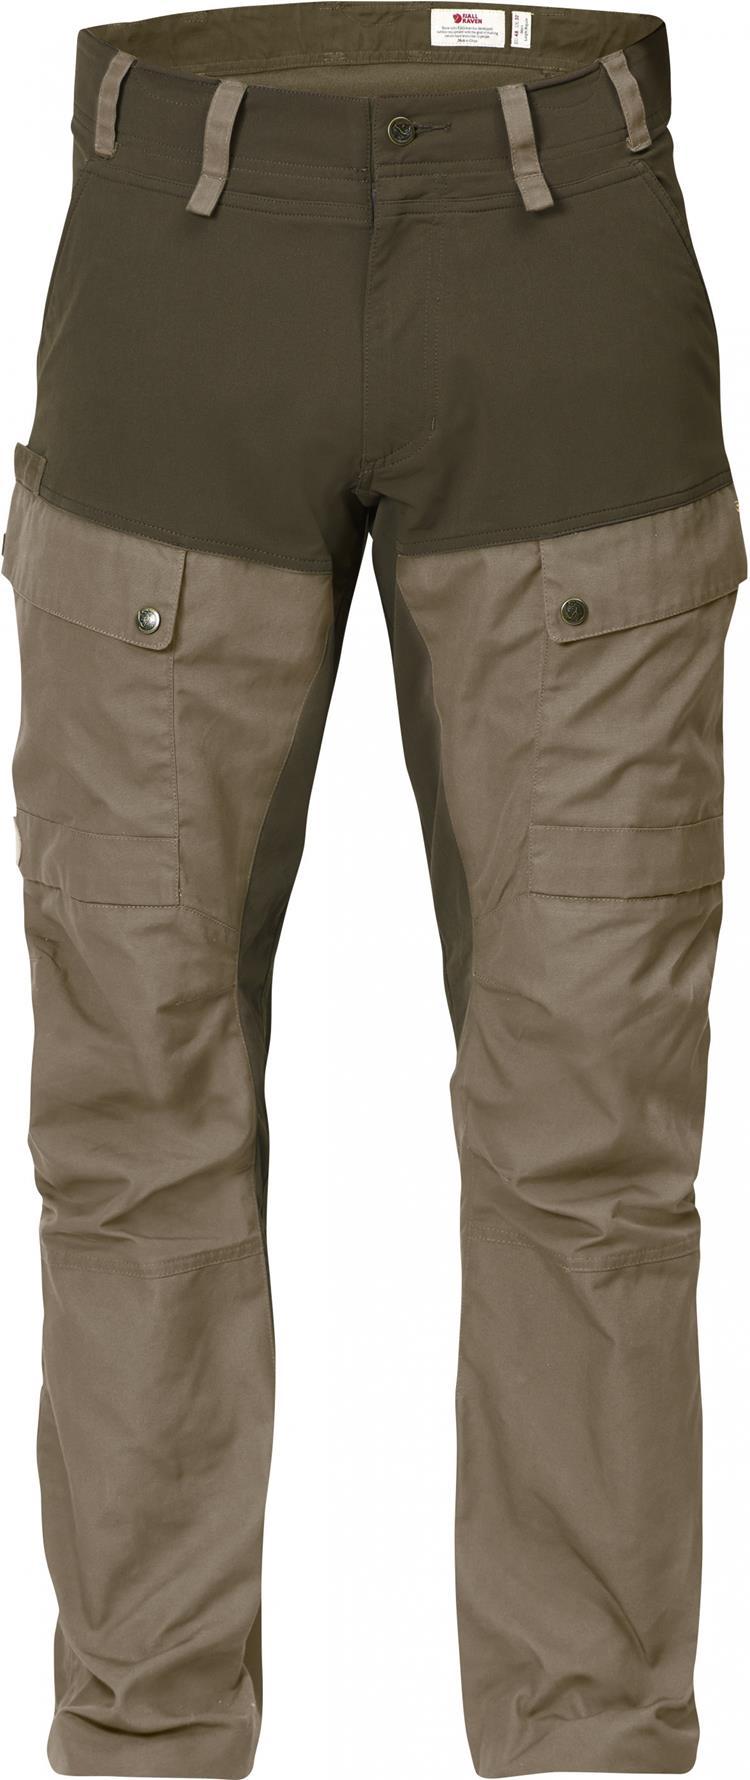 Fjallraven 小狐狸 Lappland Hybrid 狩獵長褲/工作褲/多口袋獵裝 男 90647 284褐灰